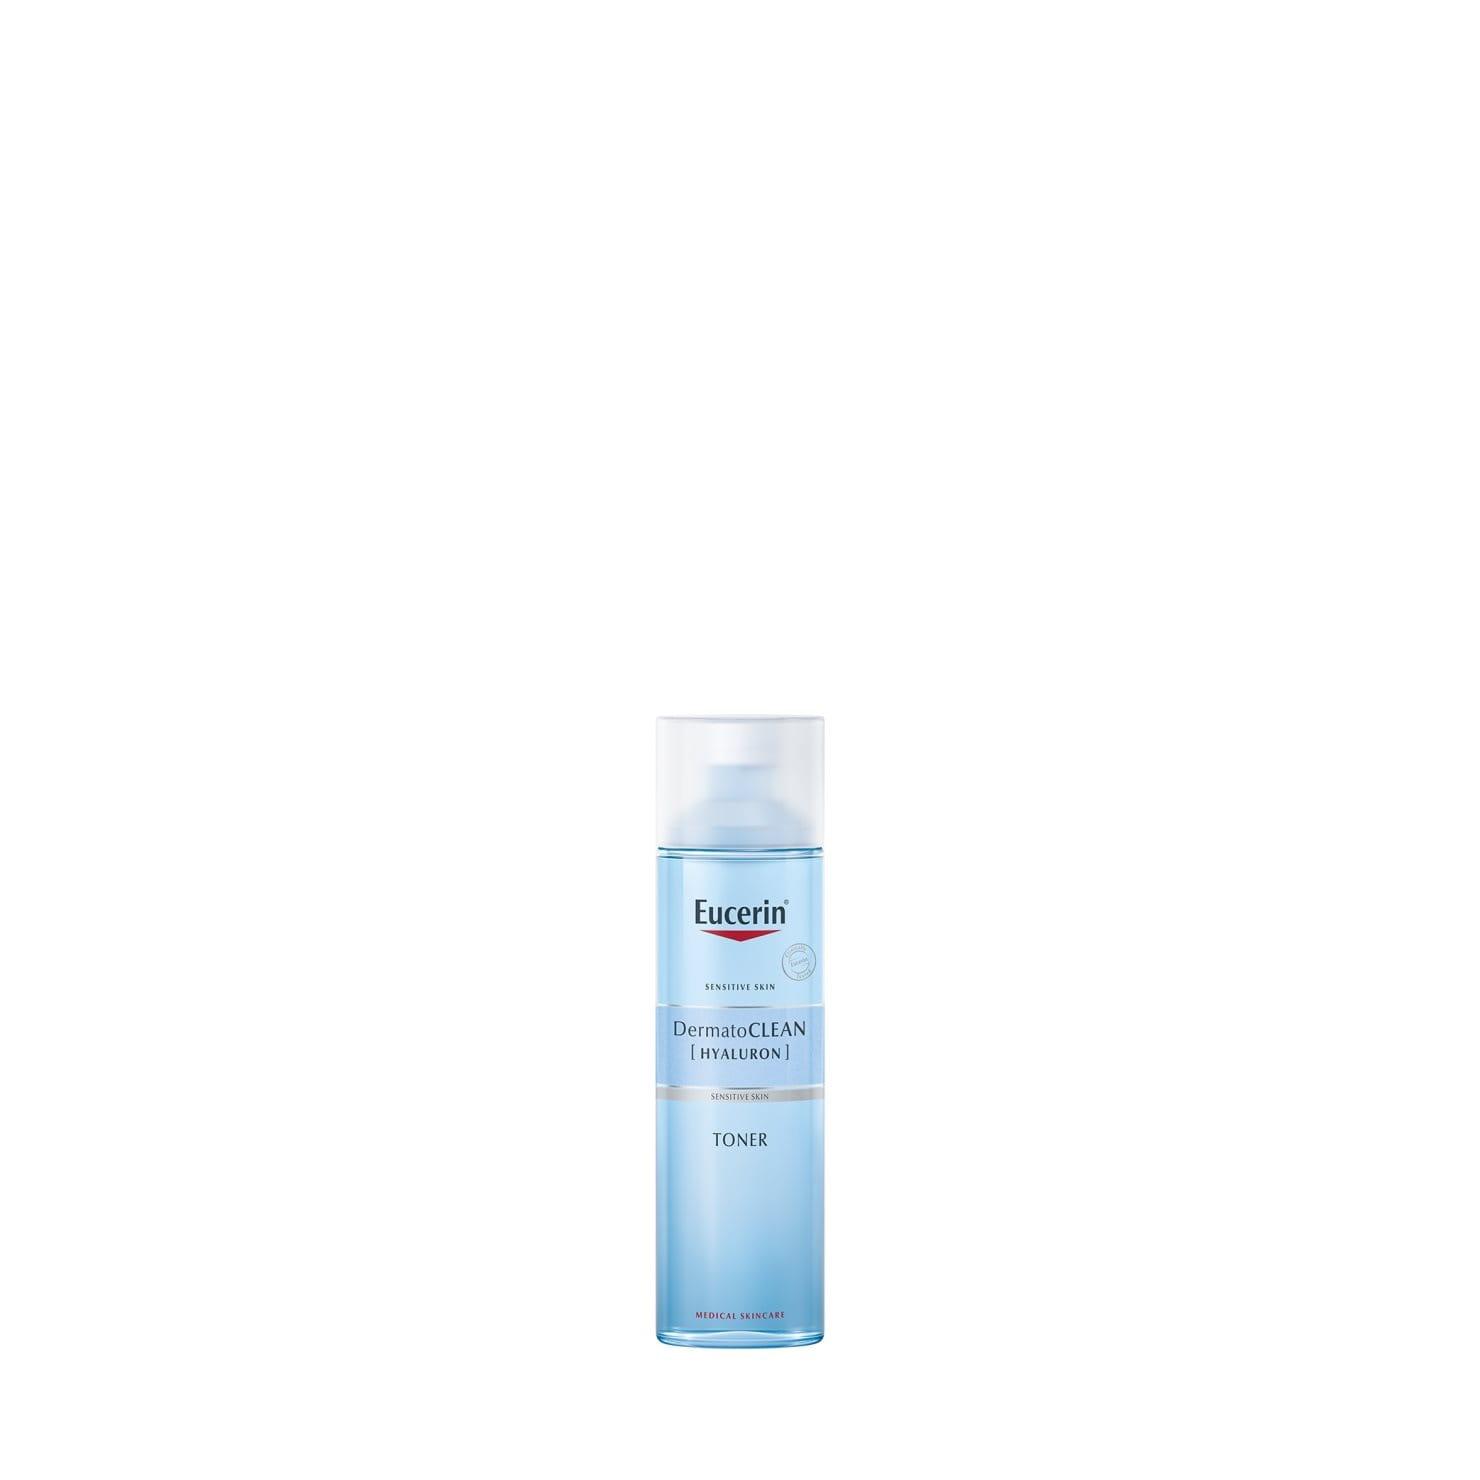 DermatoCLEAN [Hyaluron] Toner